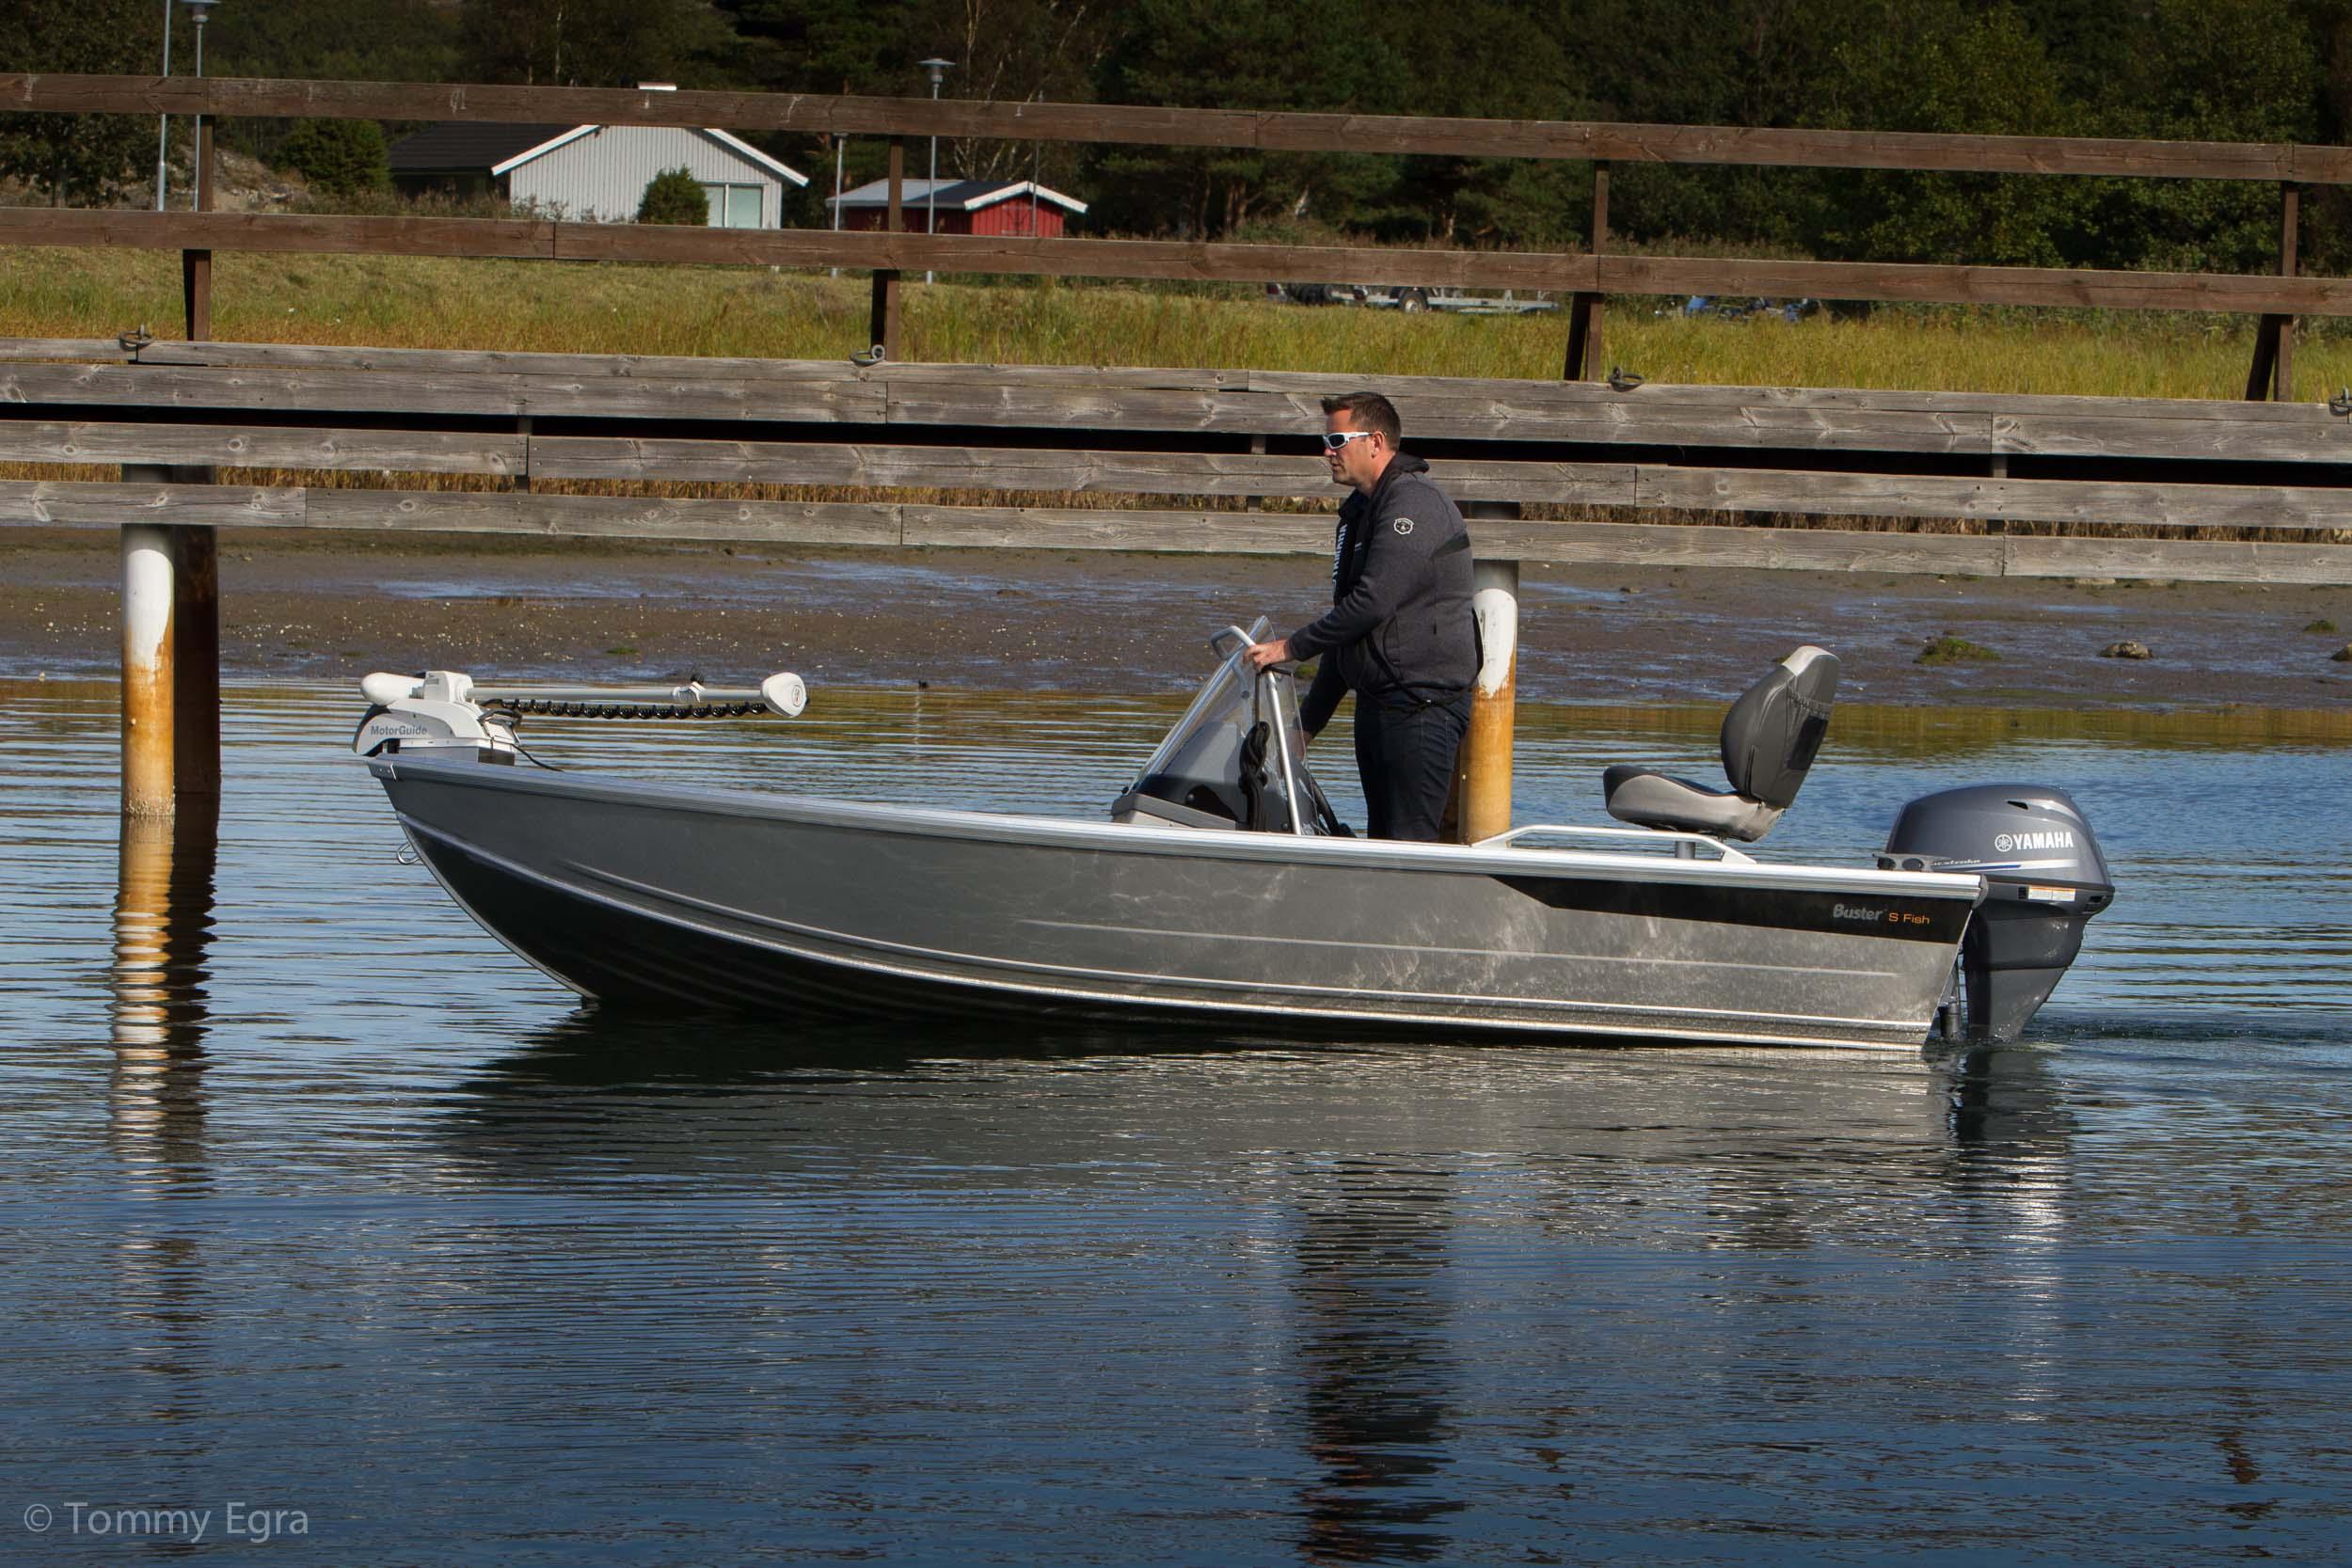 el motoren passer til de fleste båttyper, her den populære Busteren